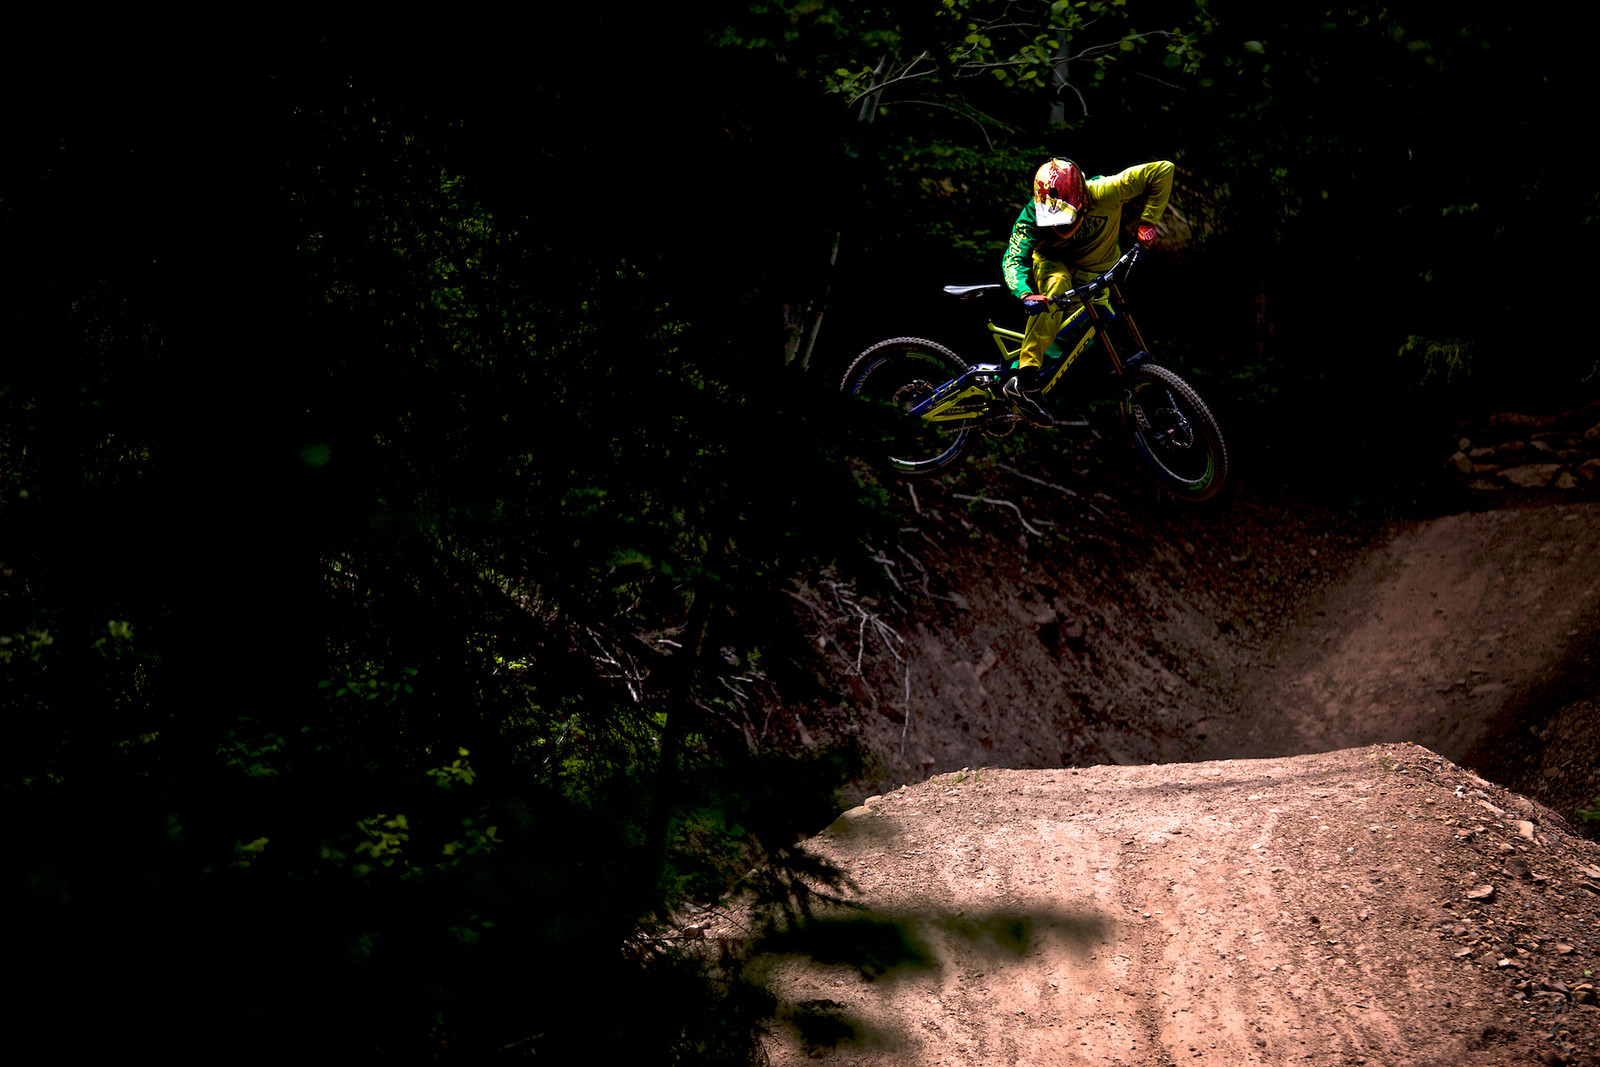 Cody Kelley - bvanavermaete - Mountain Biking Pictures - Vital MTB